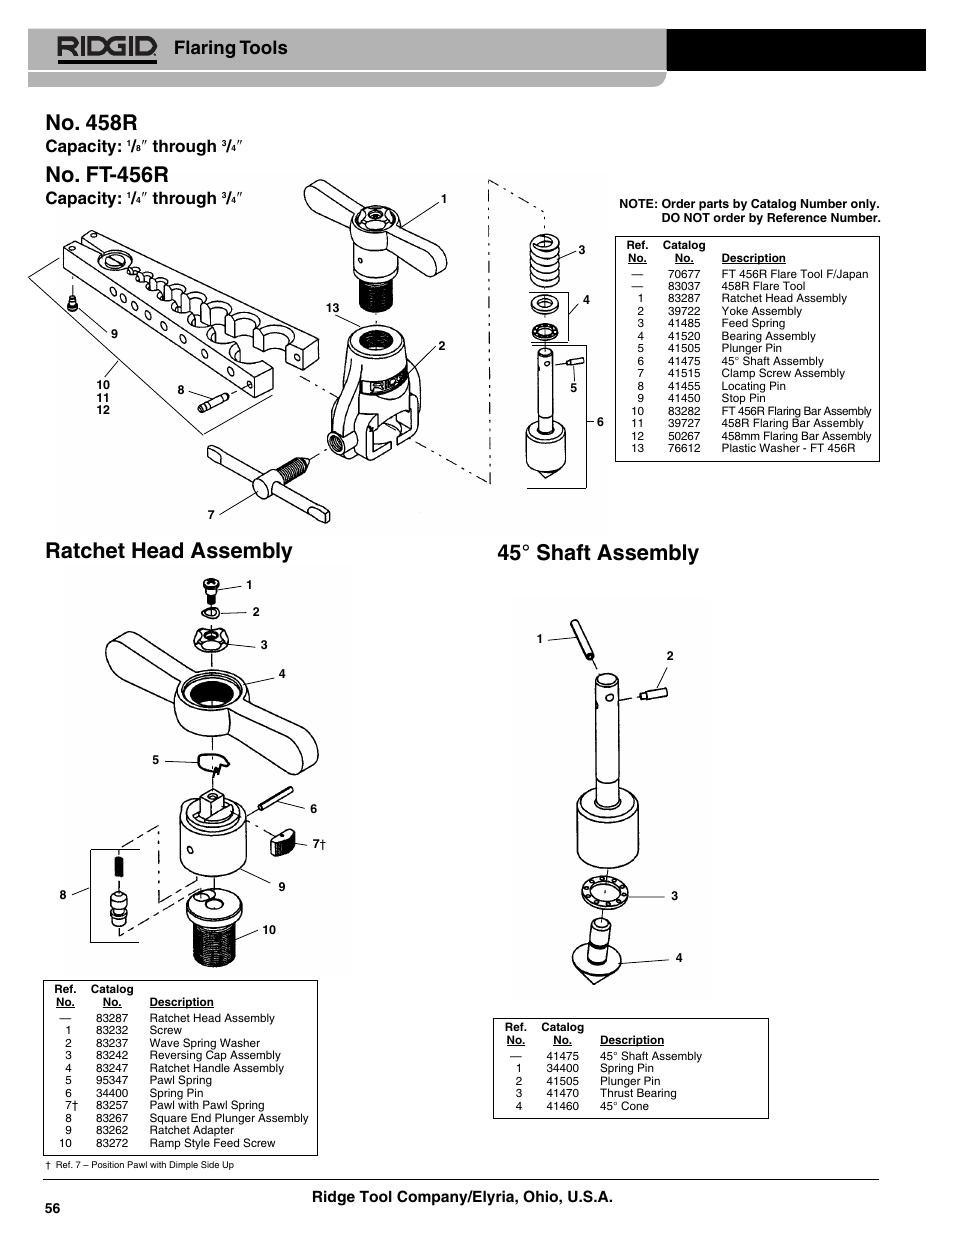 45° shaft assembly ratchet head assembly, No. 458r, No. ft